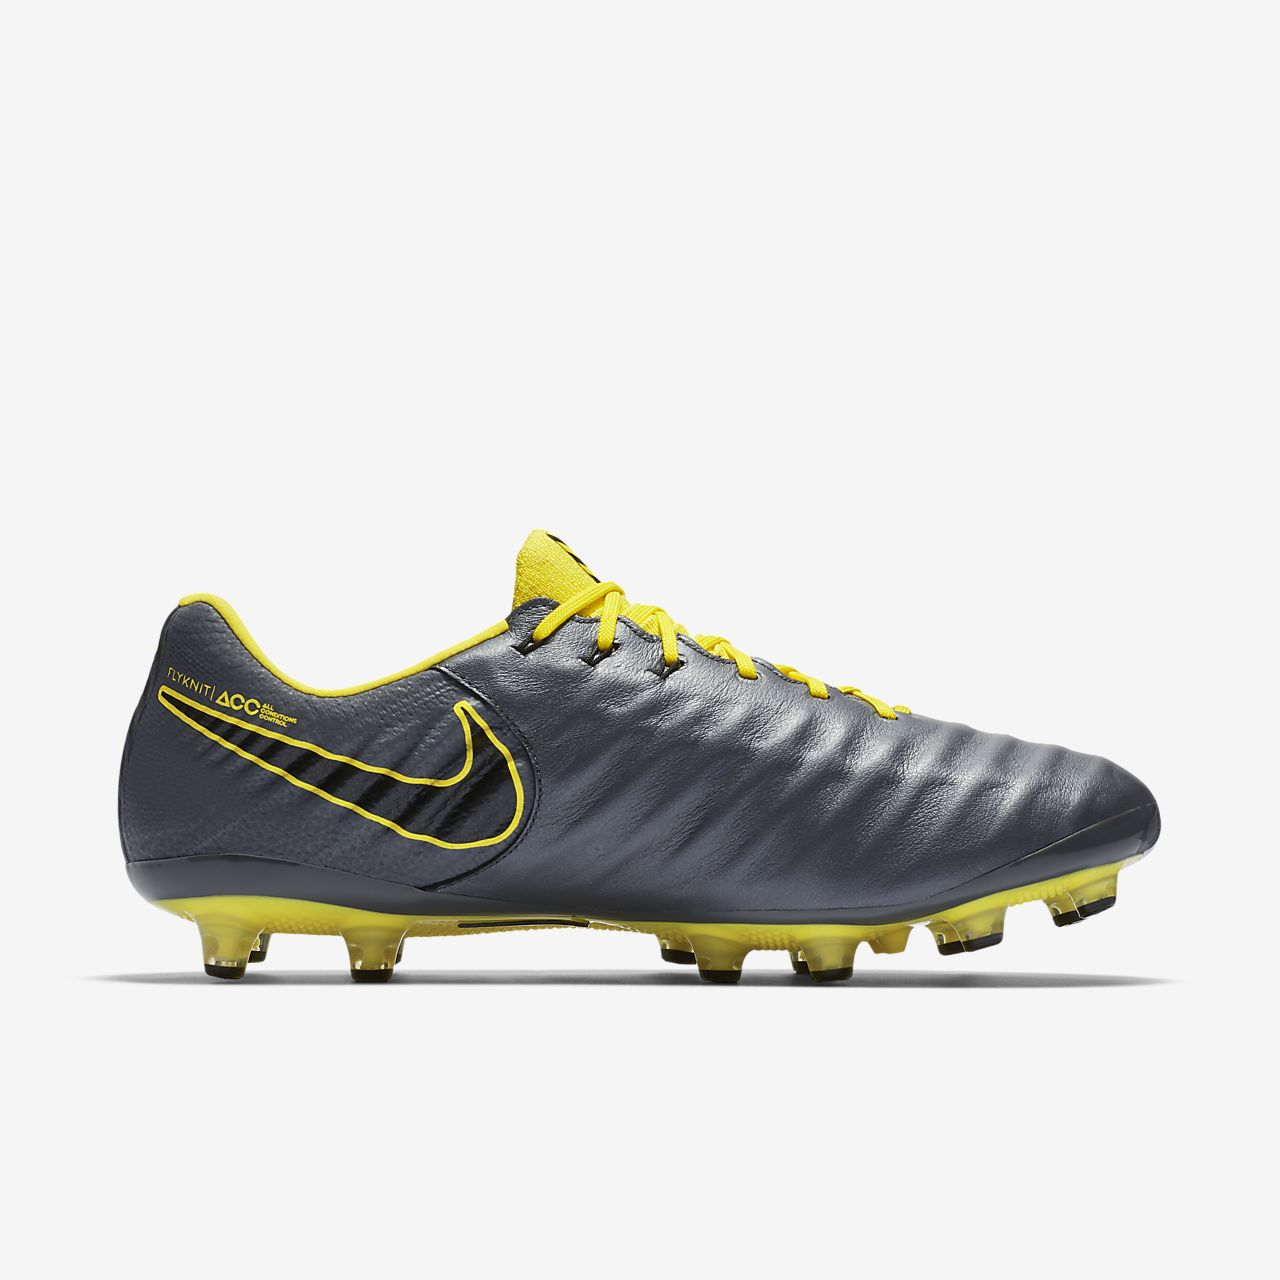 fdff7449f Nike Tiempo Legend 7 Elite FG Homme Football Crampons Taille 4 US Bleu  Blanc Chaussures de football